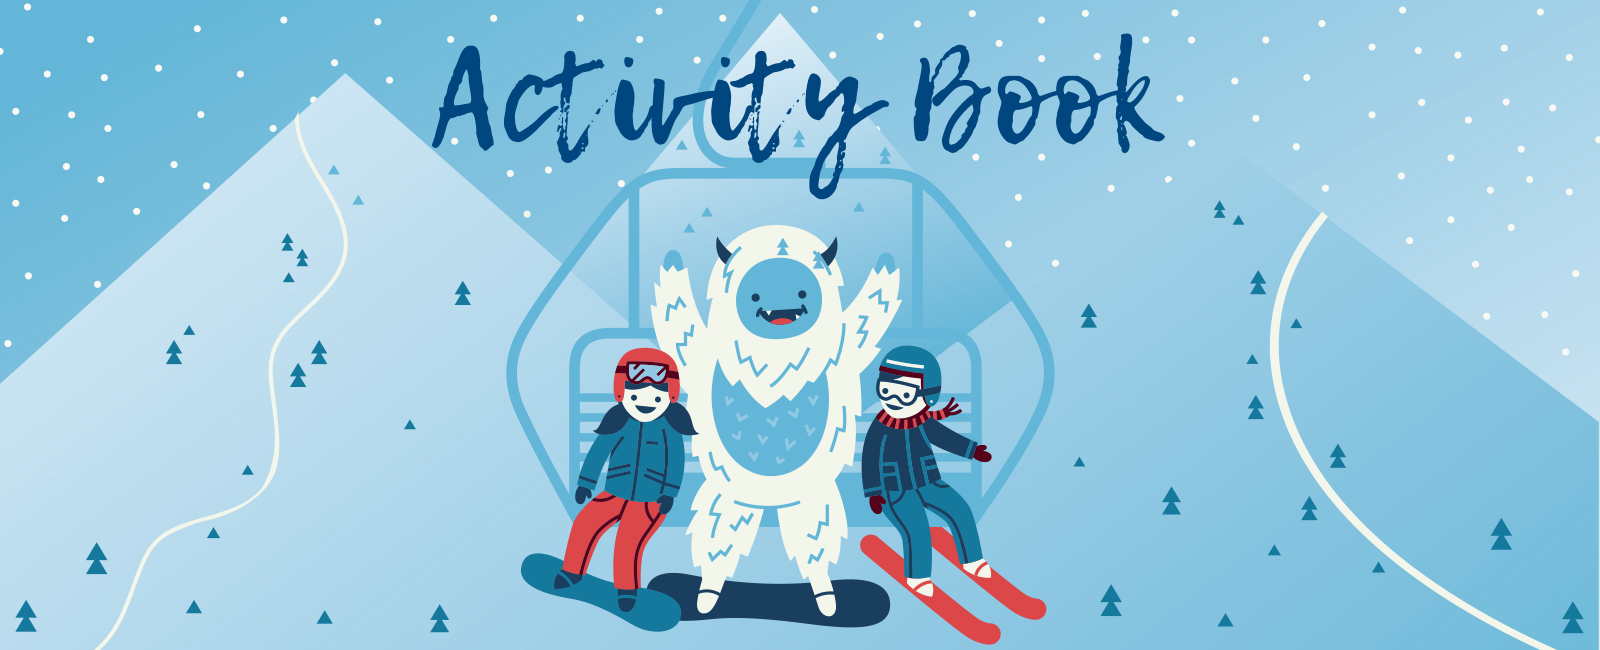 15 Resort Ski Activity Booklet